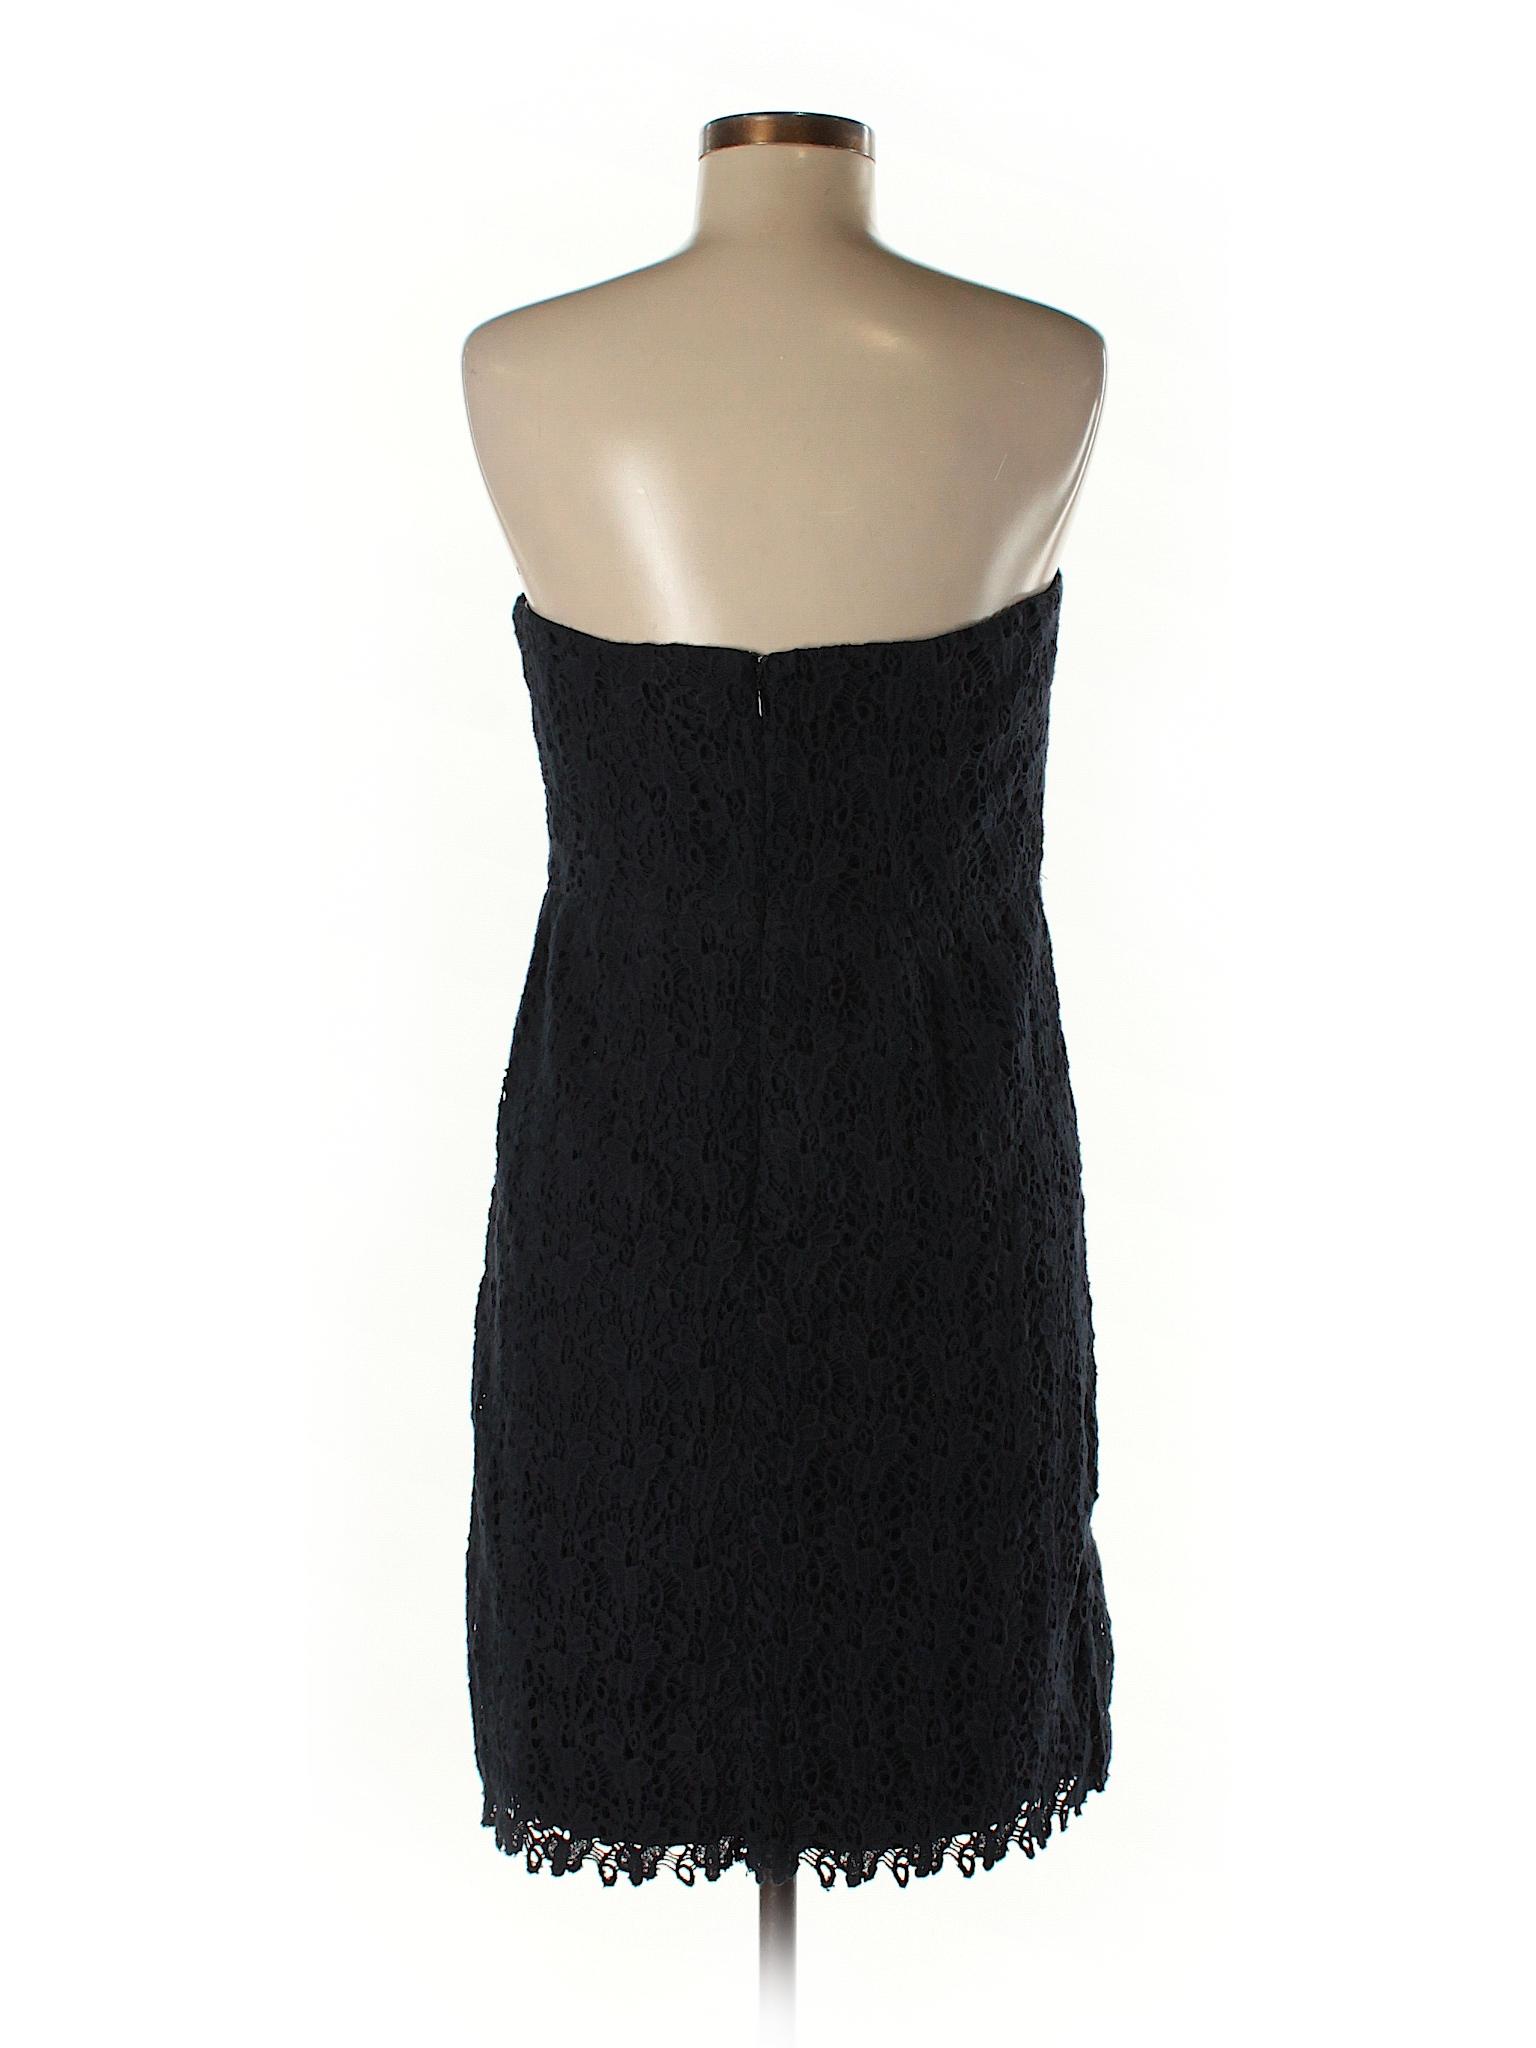 Casual Dress winter Boutique Tommy Hilfiger qwOtTvP